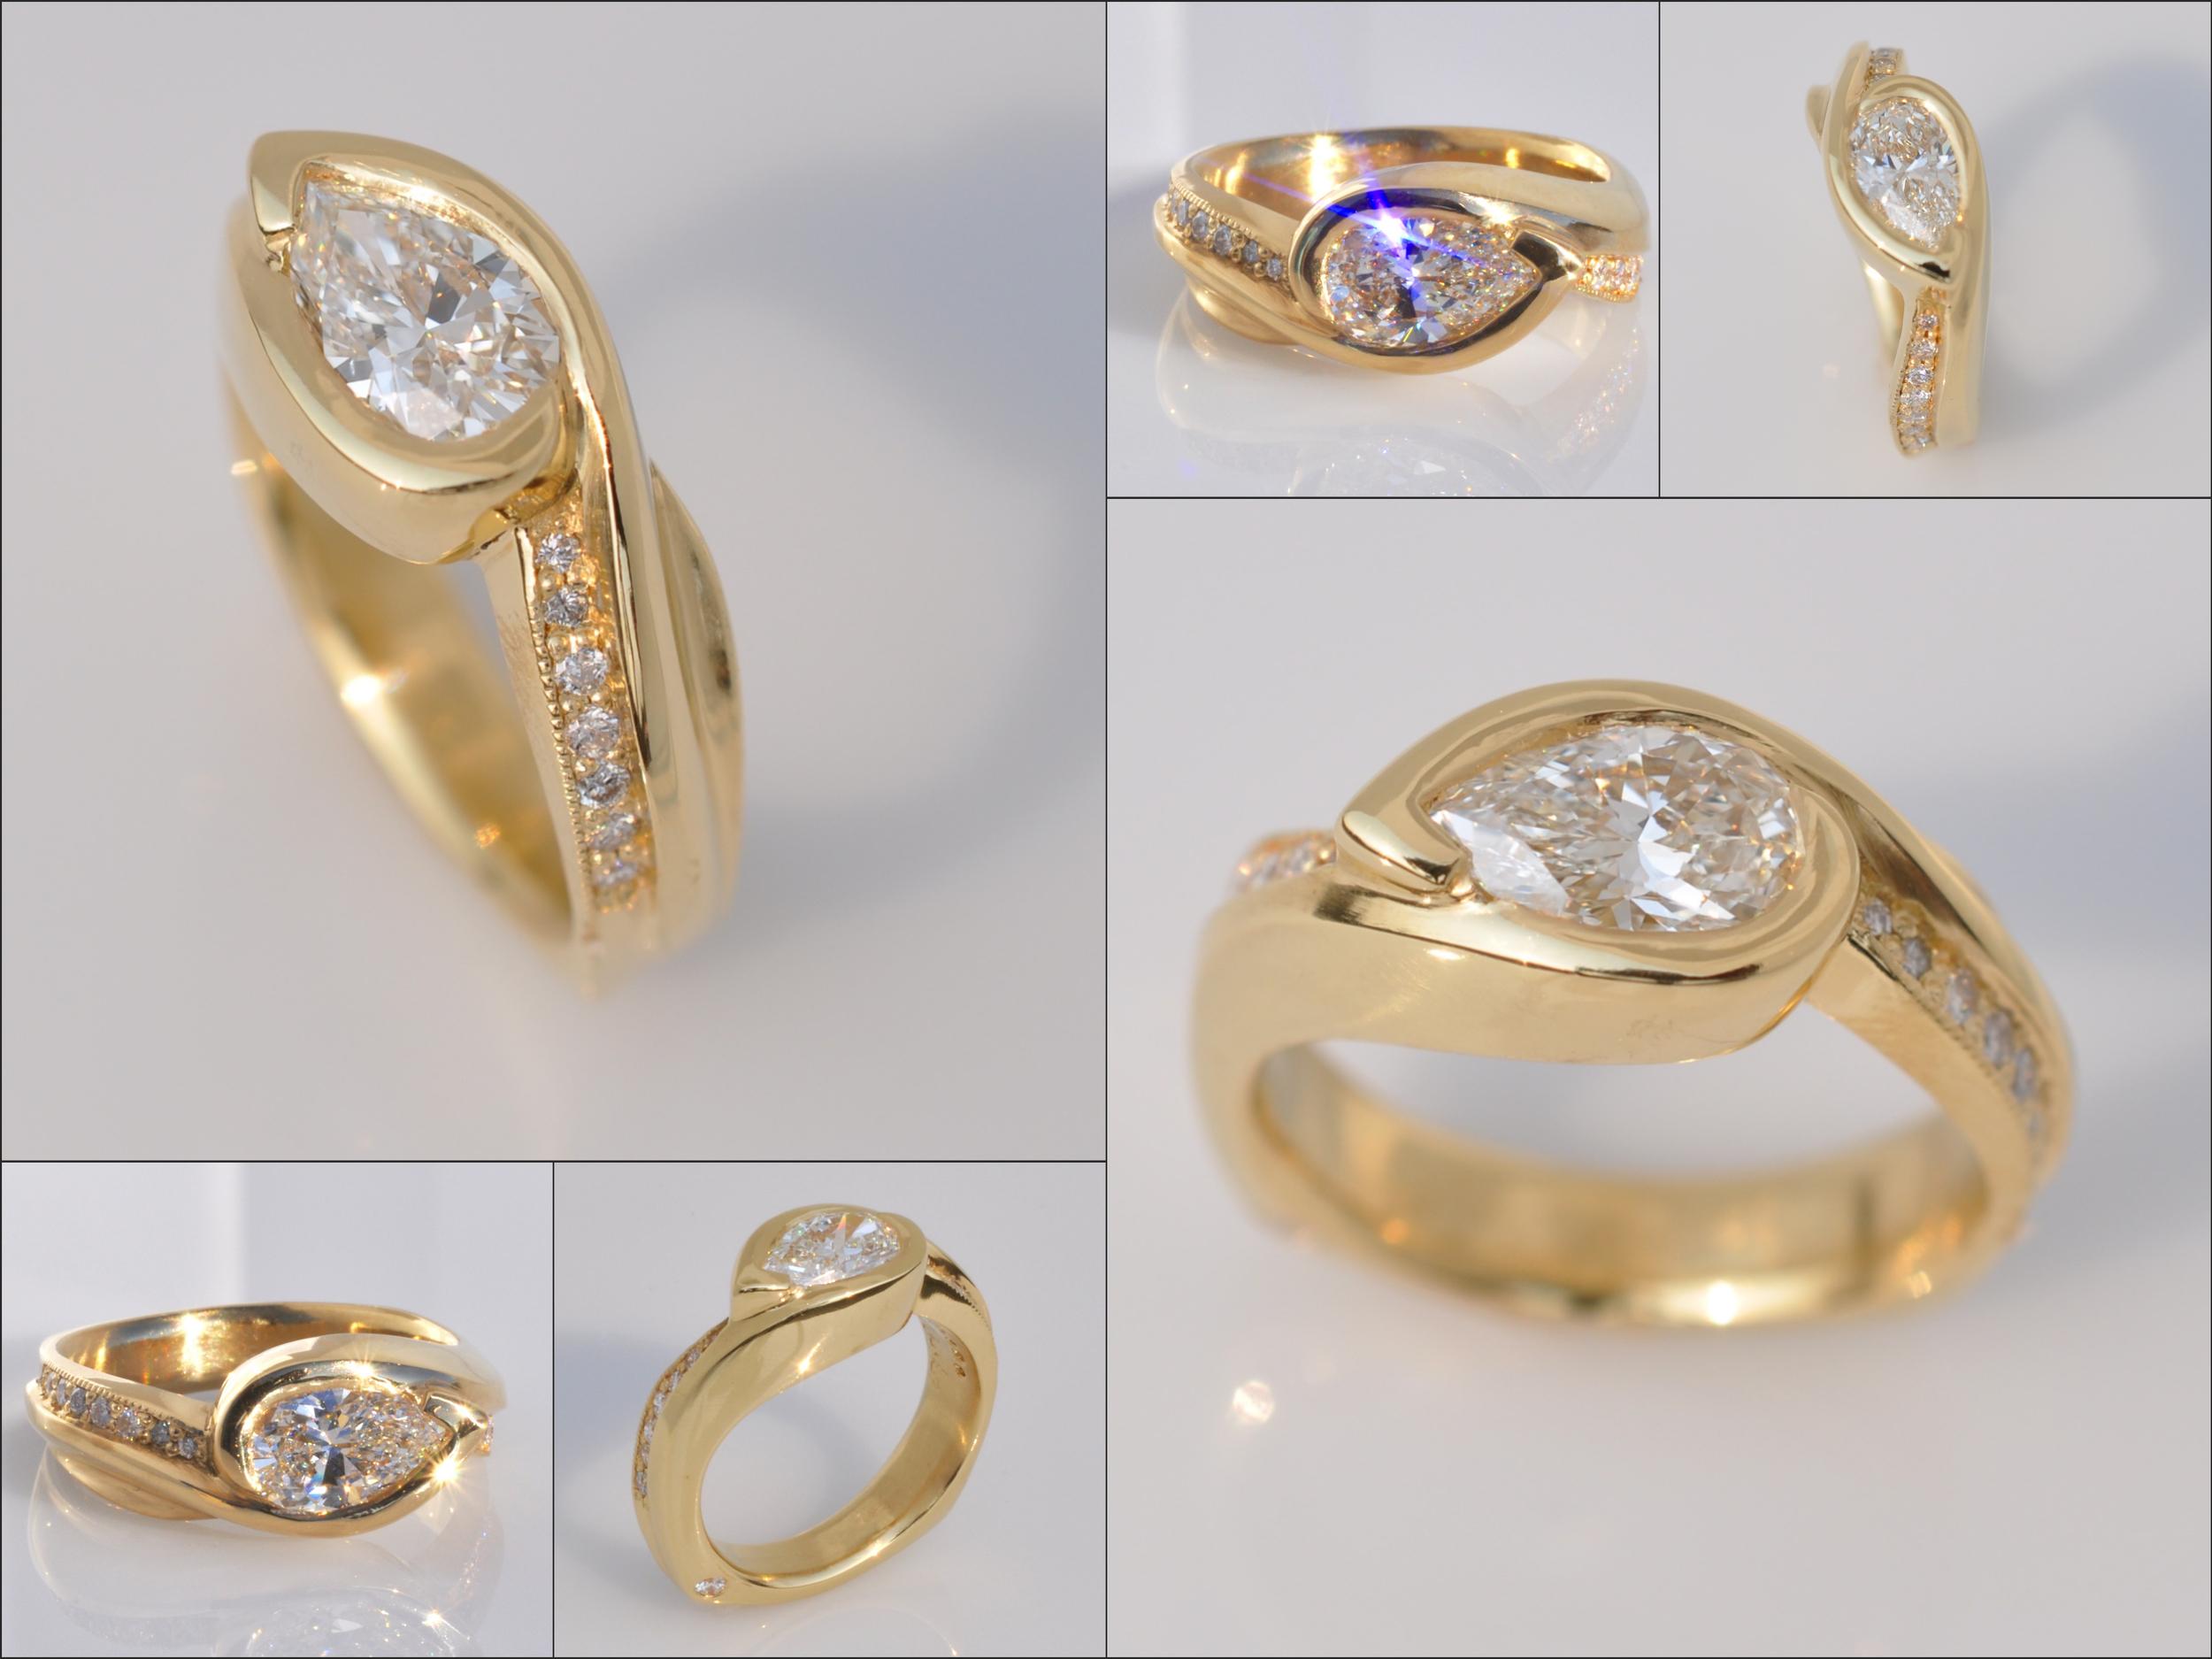 22k gold Waylon Rhoads Original featuring a 1.01 carat pear shape diamond and .18 cttw diamond melee.